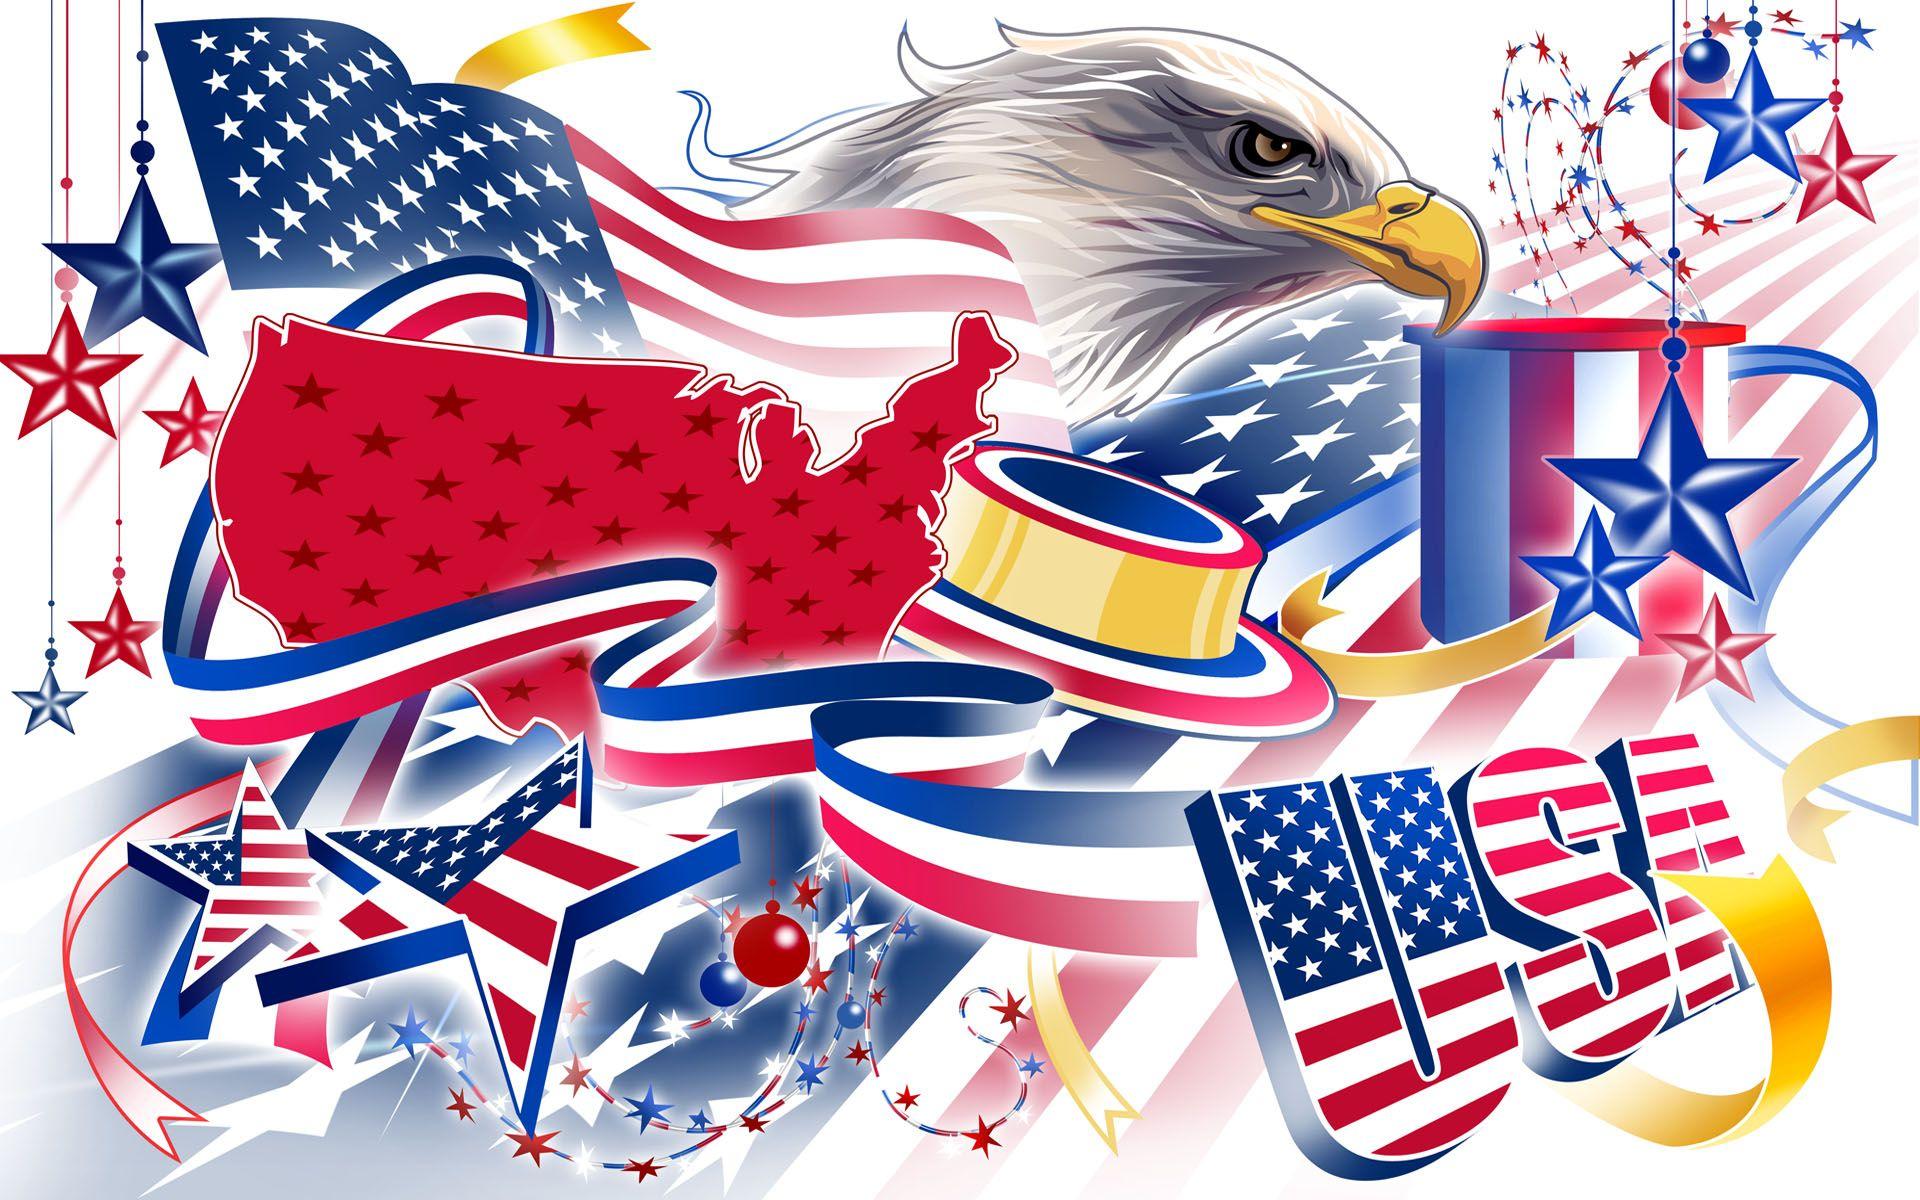 american eagle usa jpg american eagle flag - American